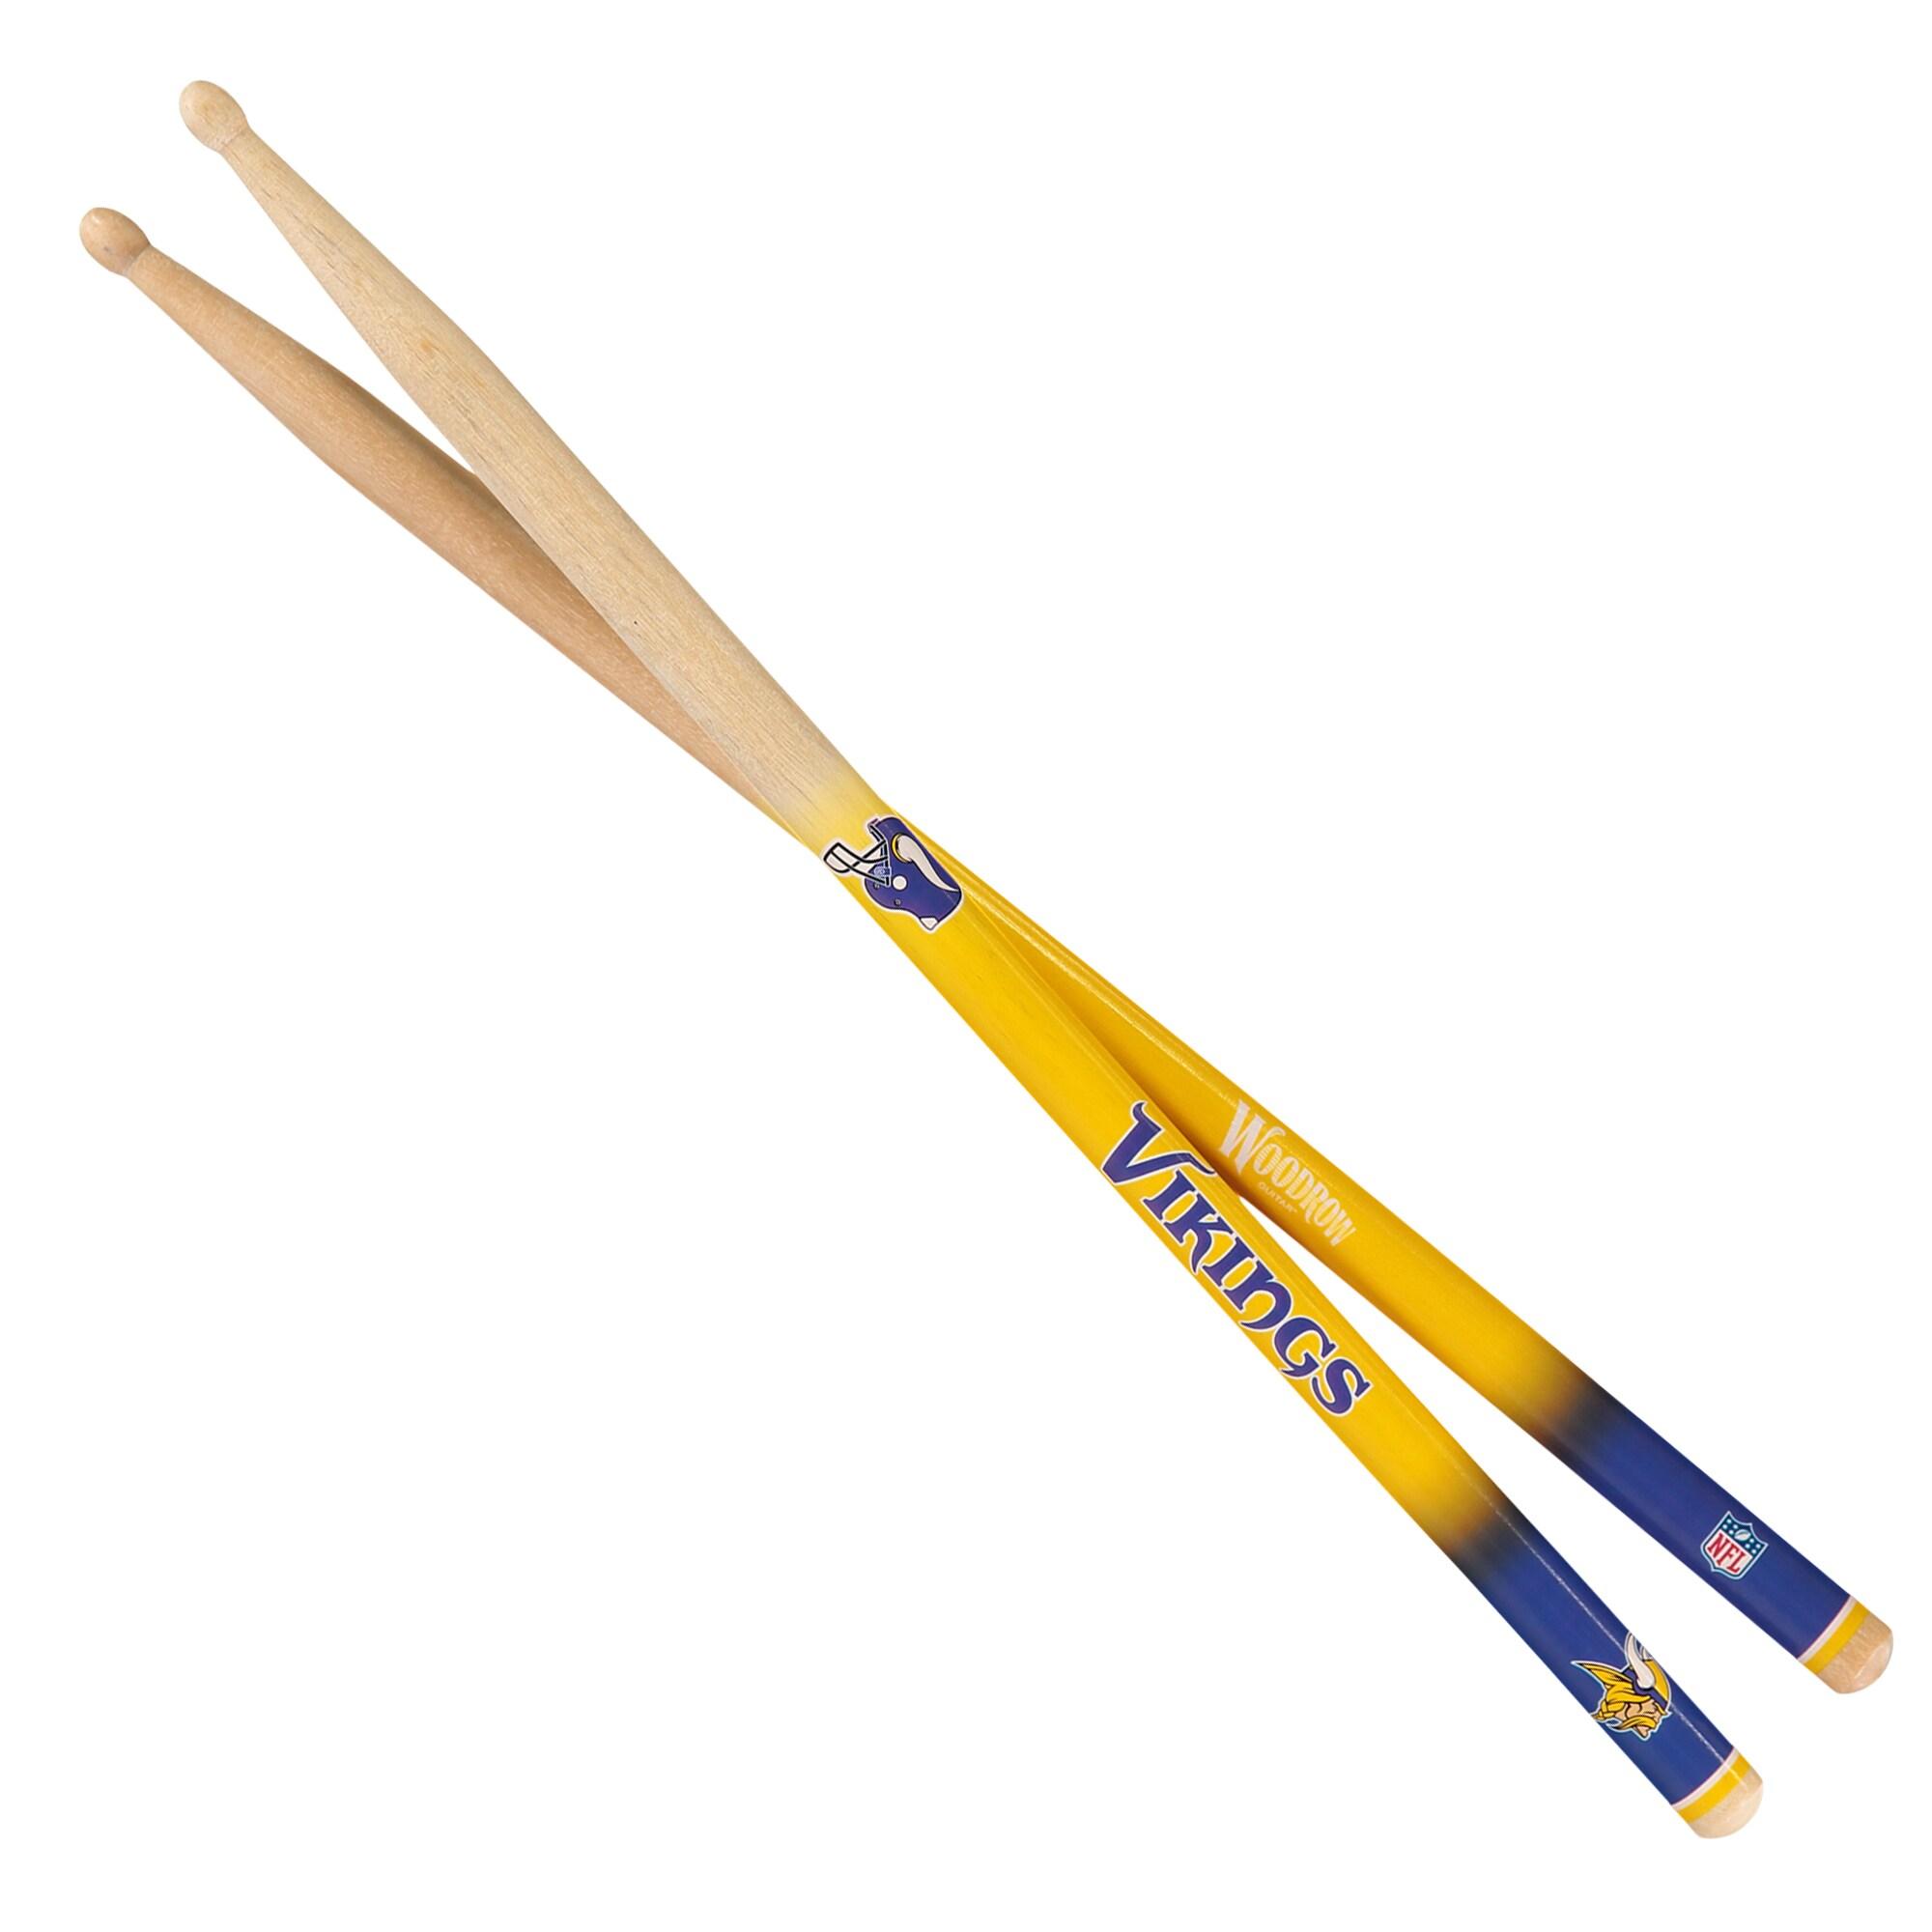 Minnesota Vikings Woodrow Guitar Drum Sticks